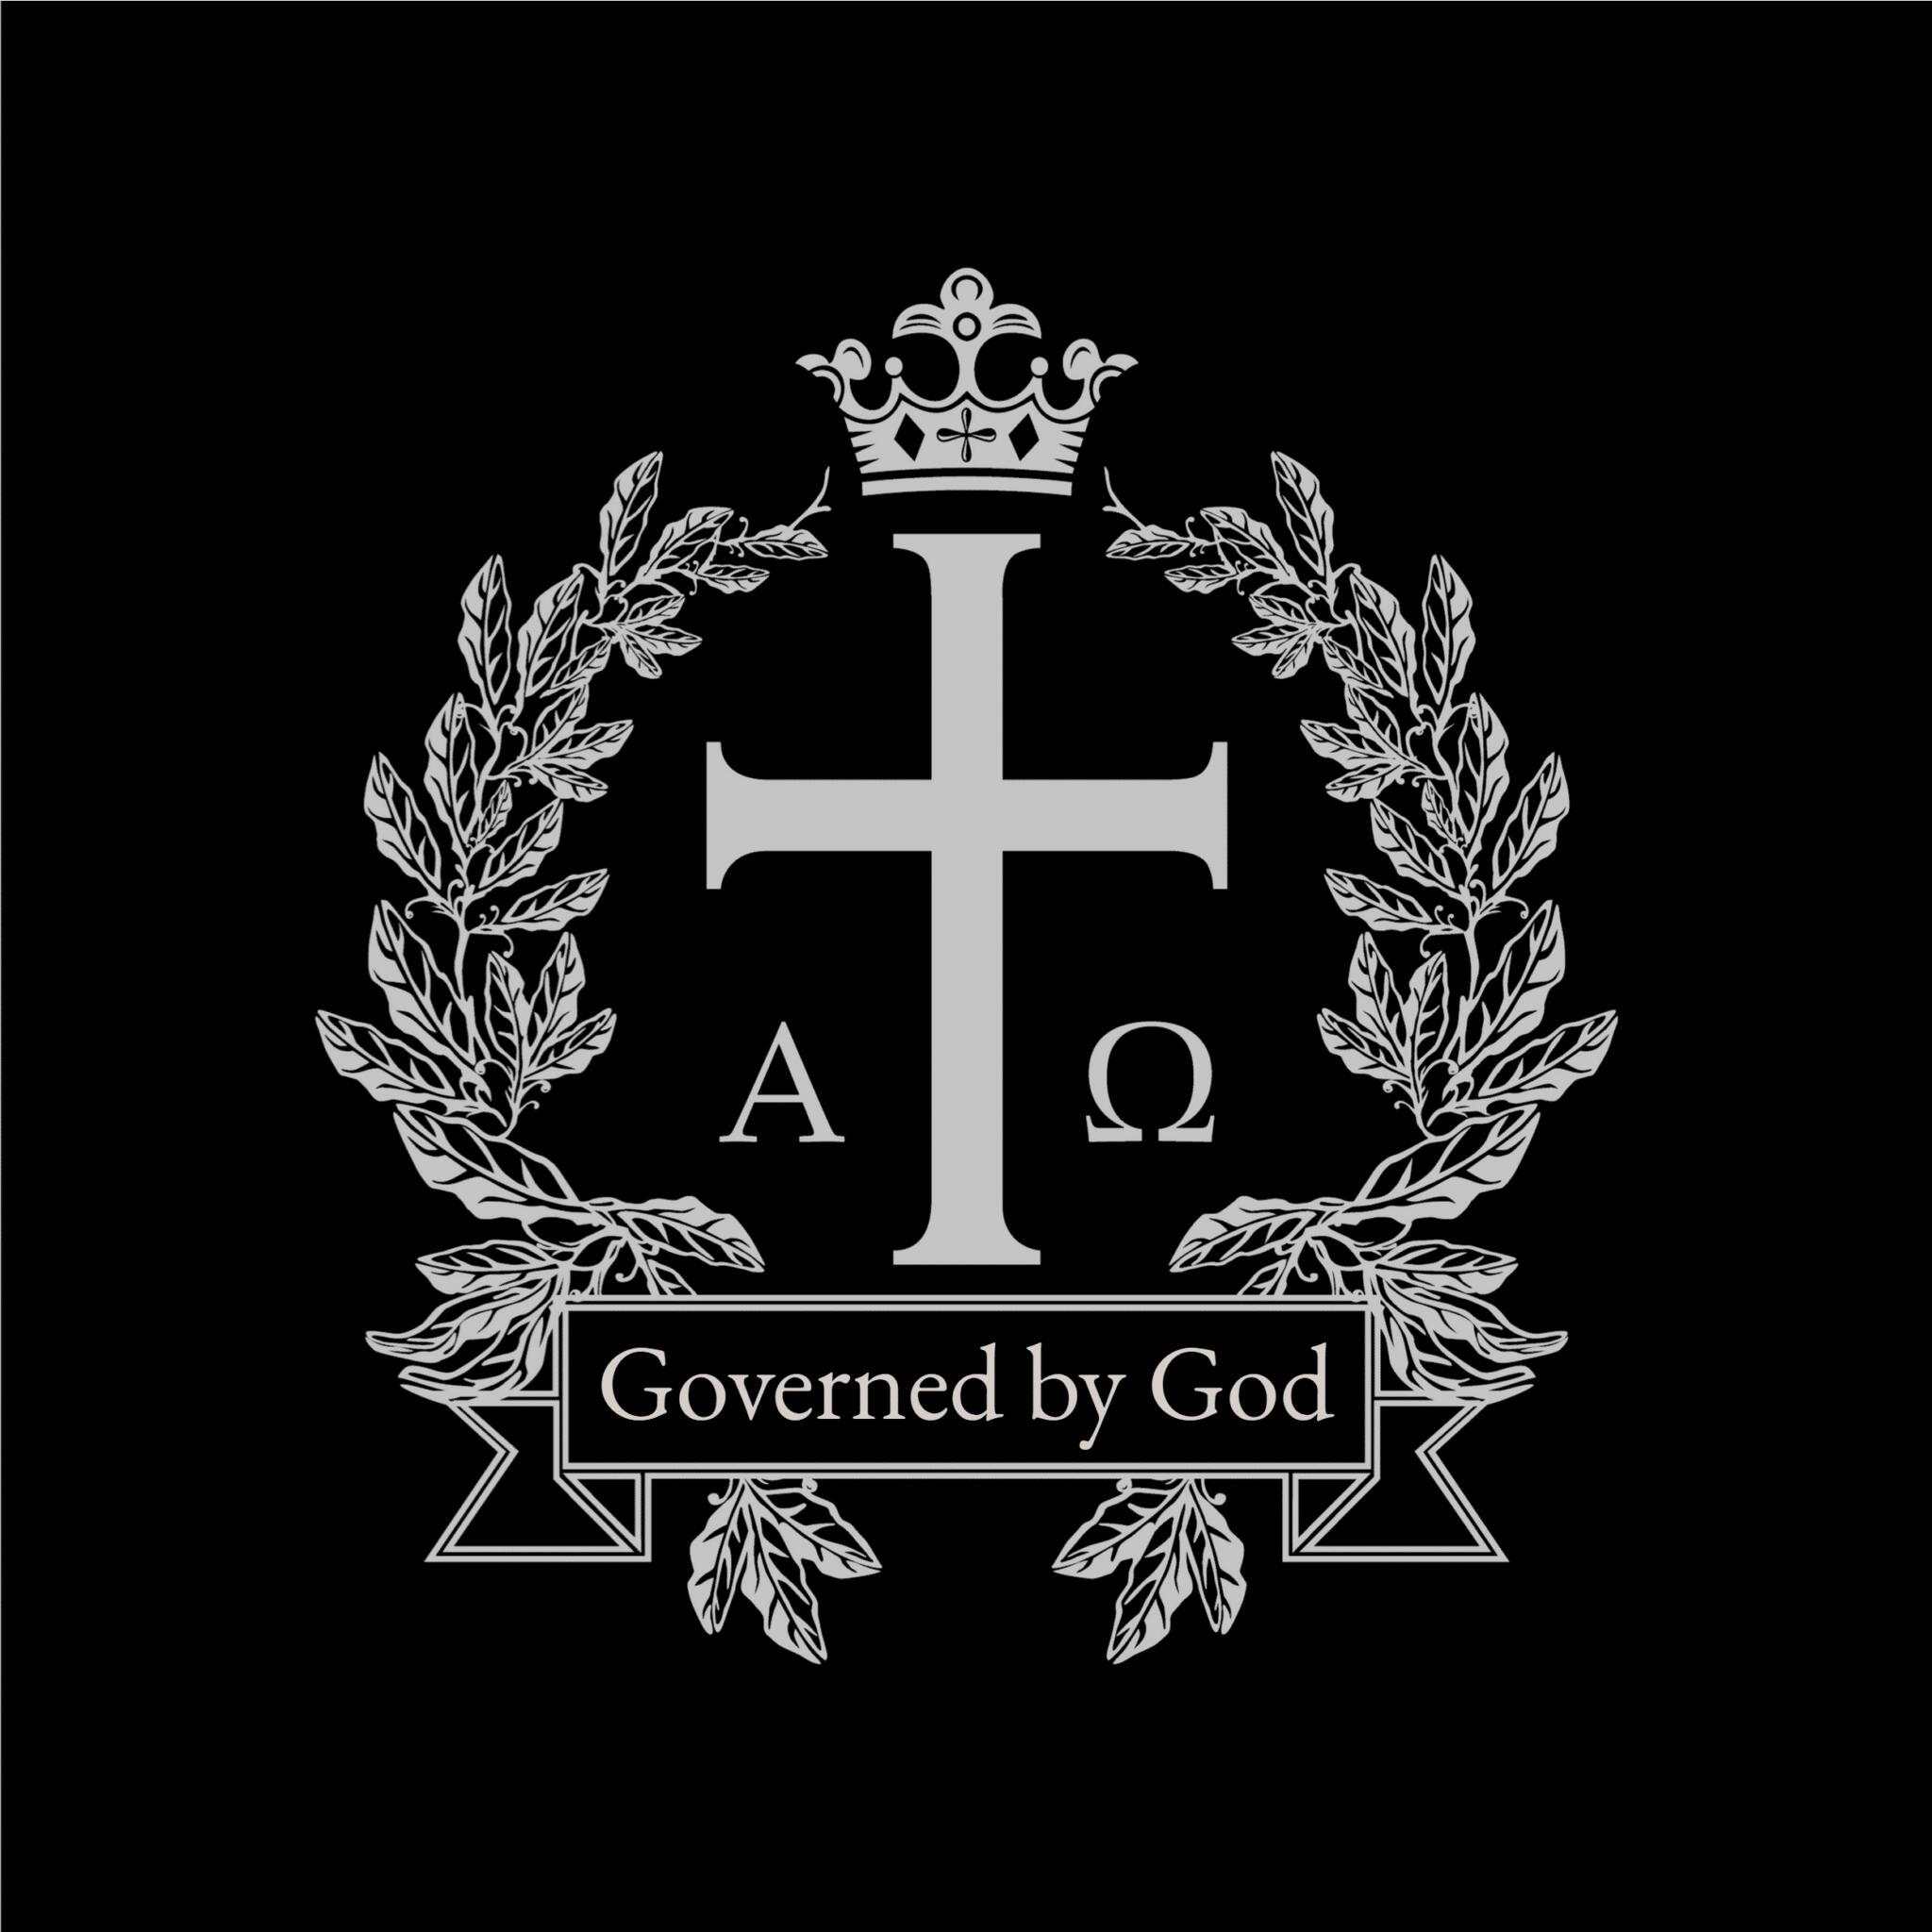 Governed by God